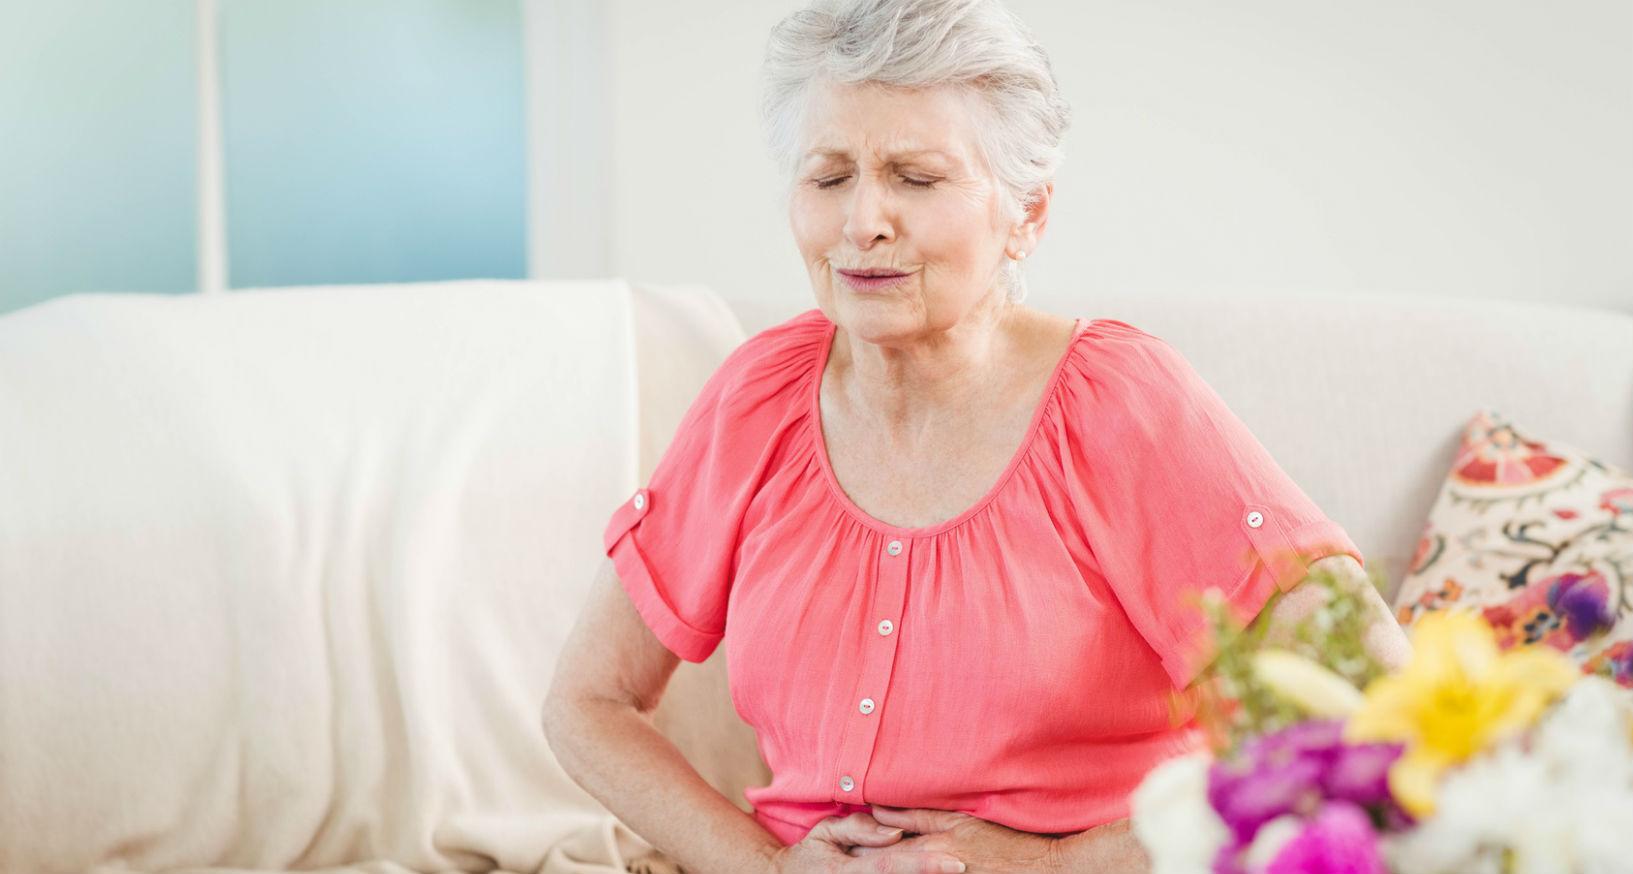 удаление матки при сд 2типа 60 лет